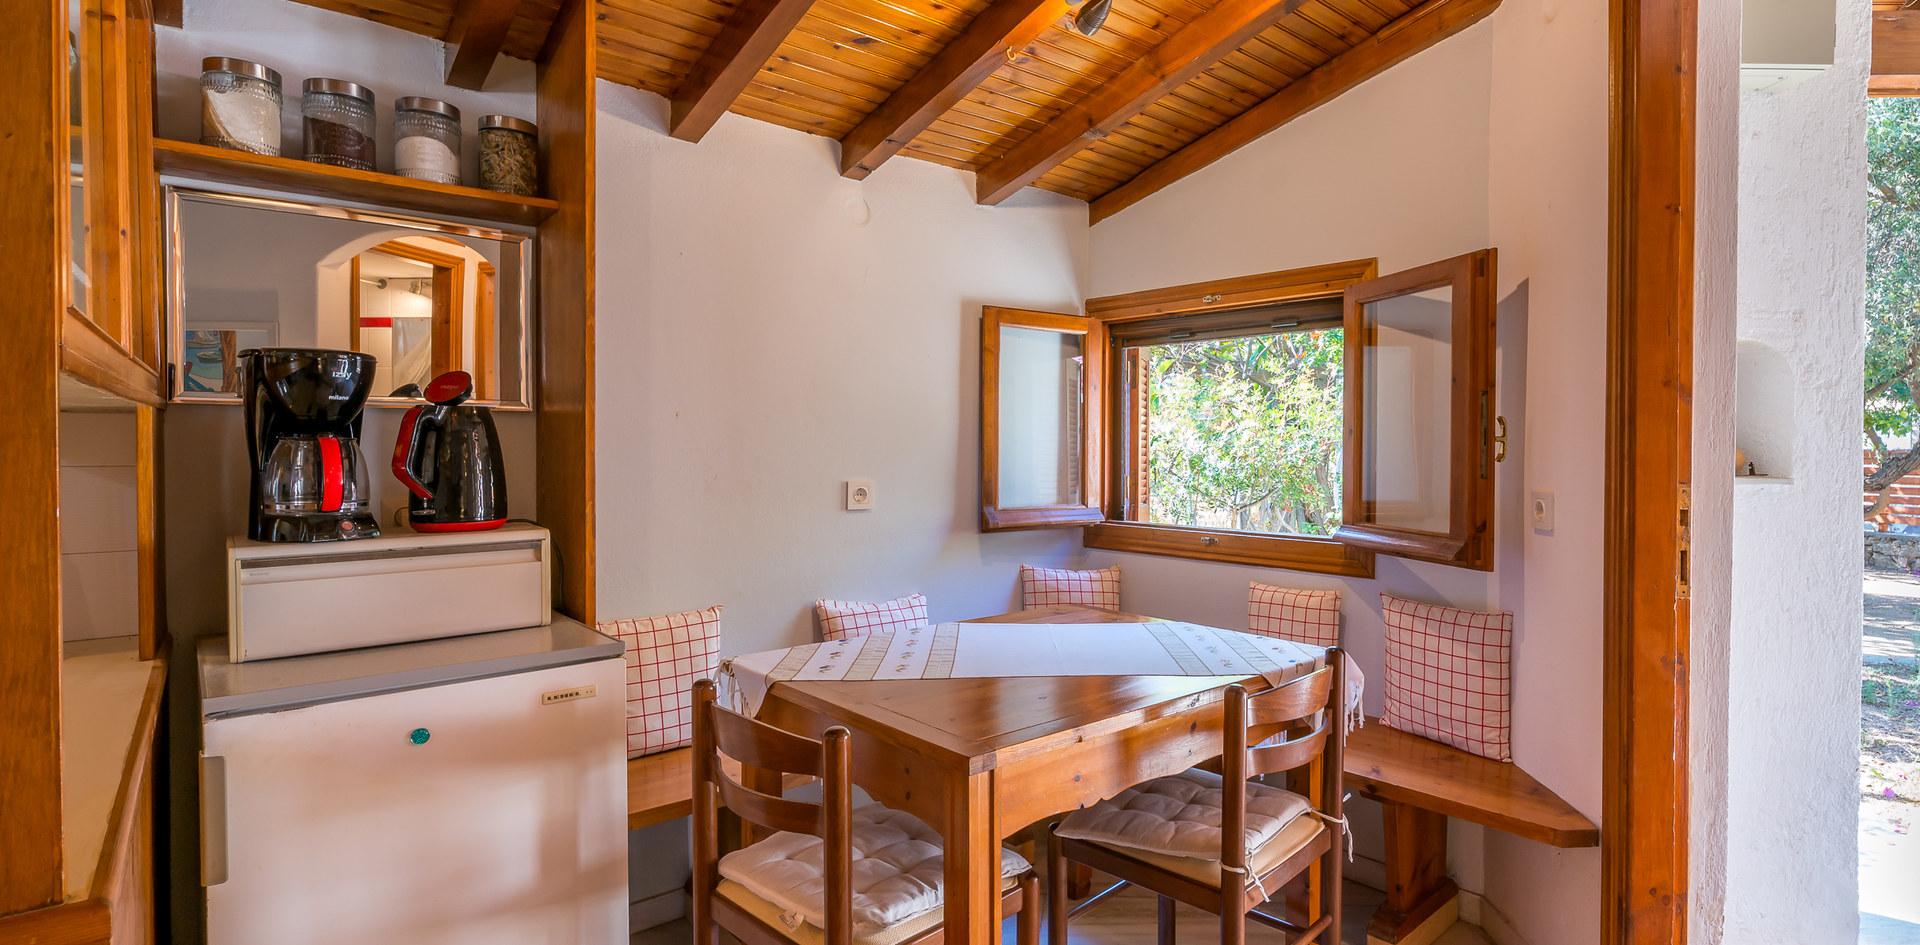 Aegina house for rent